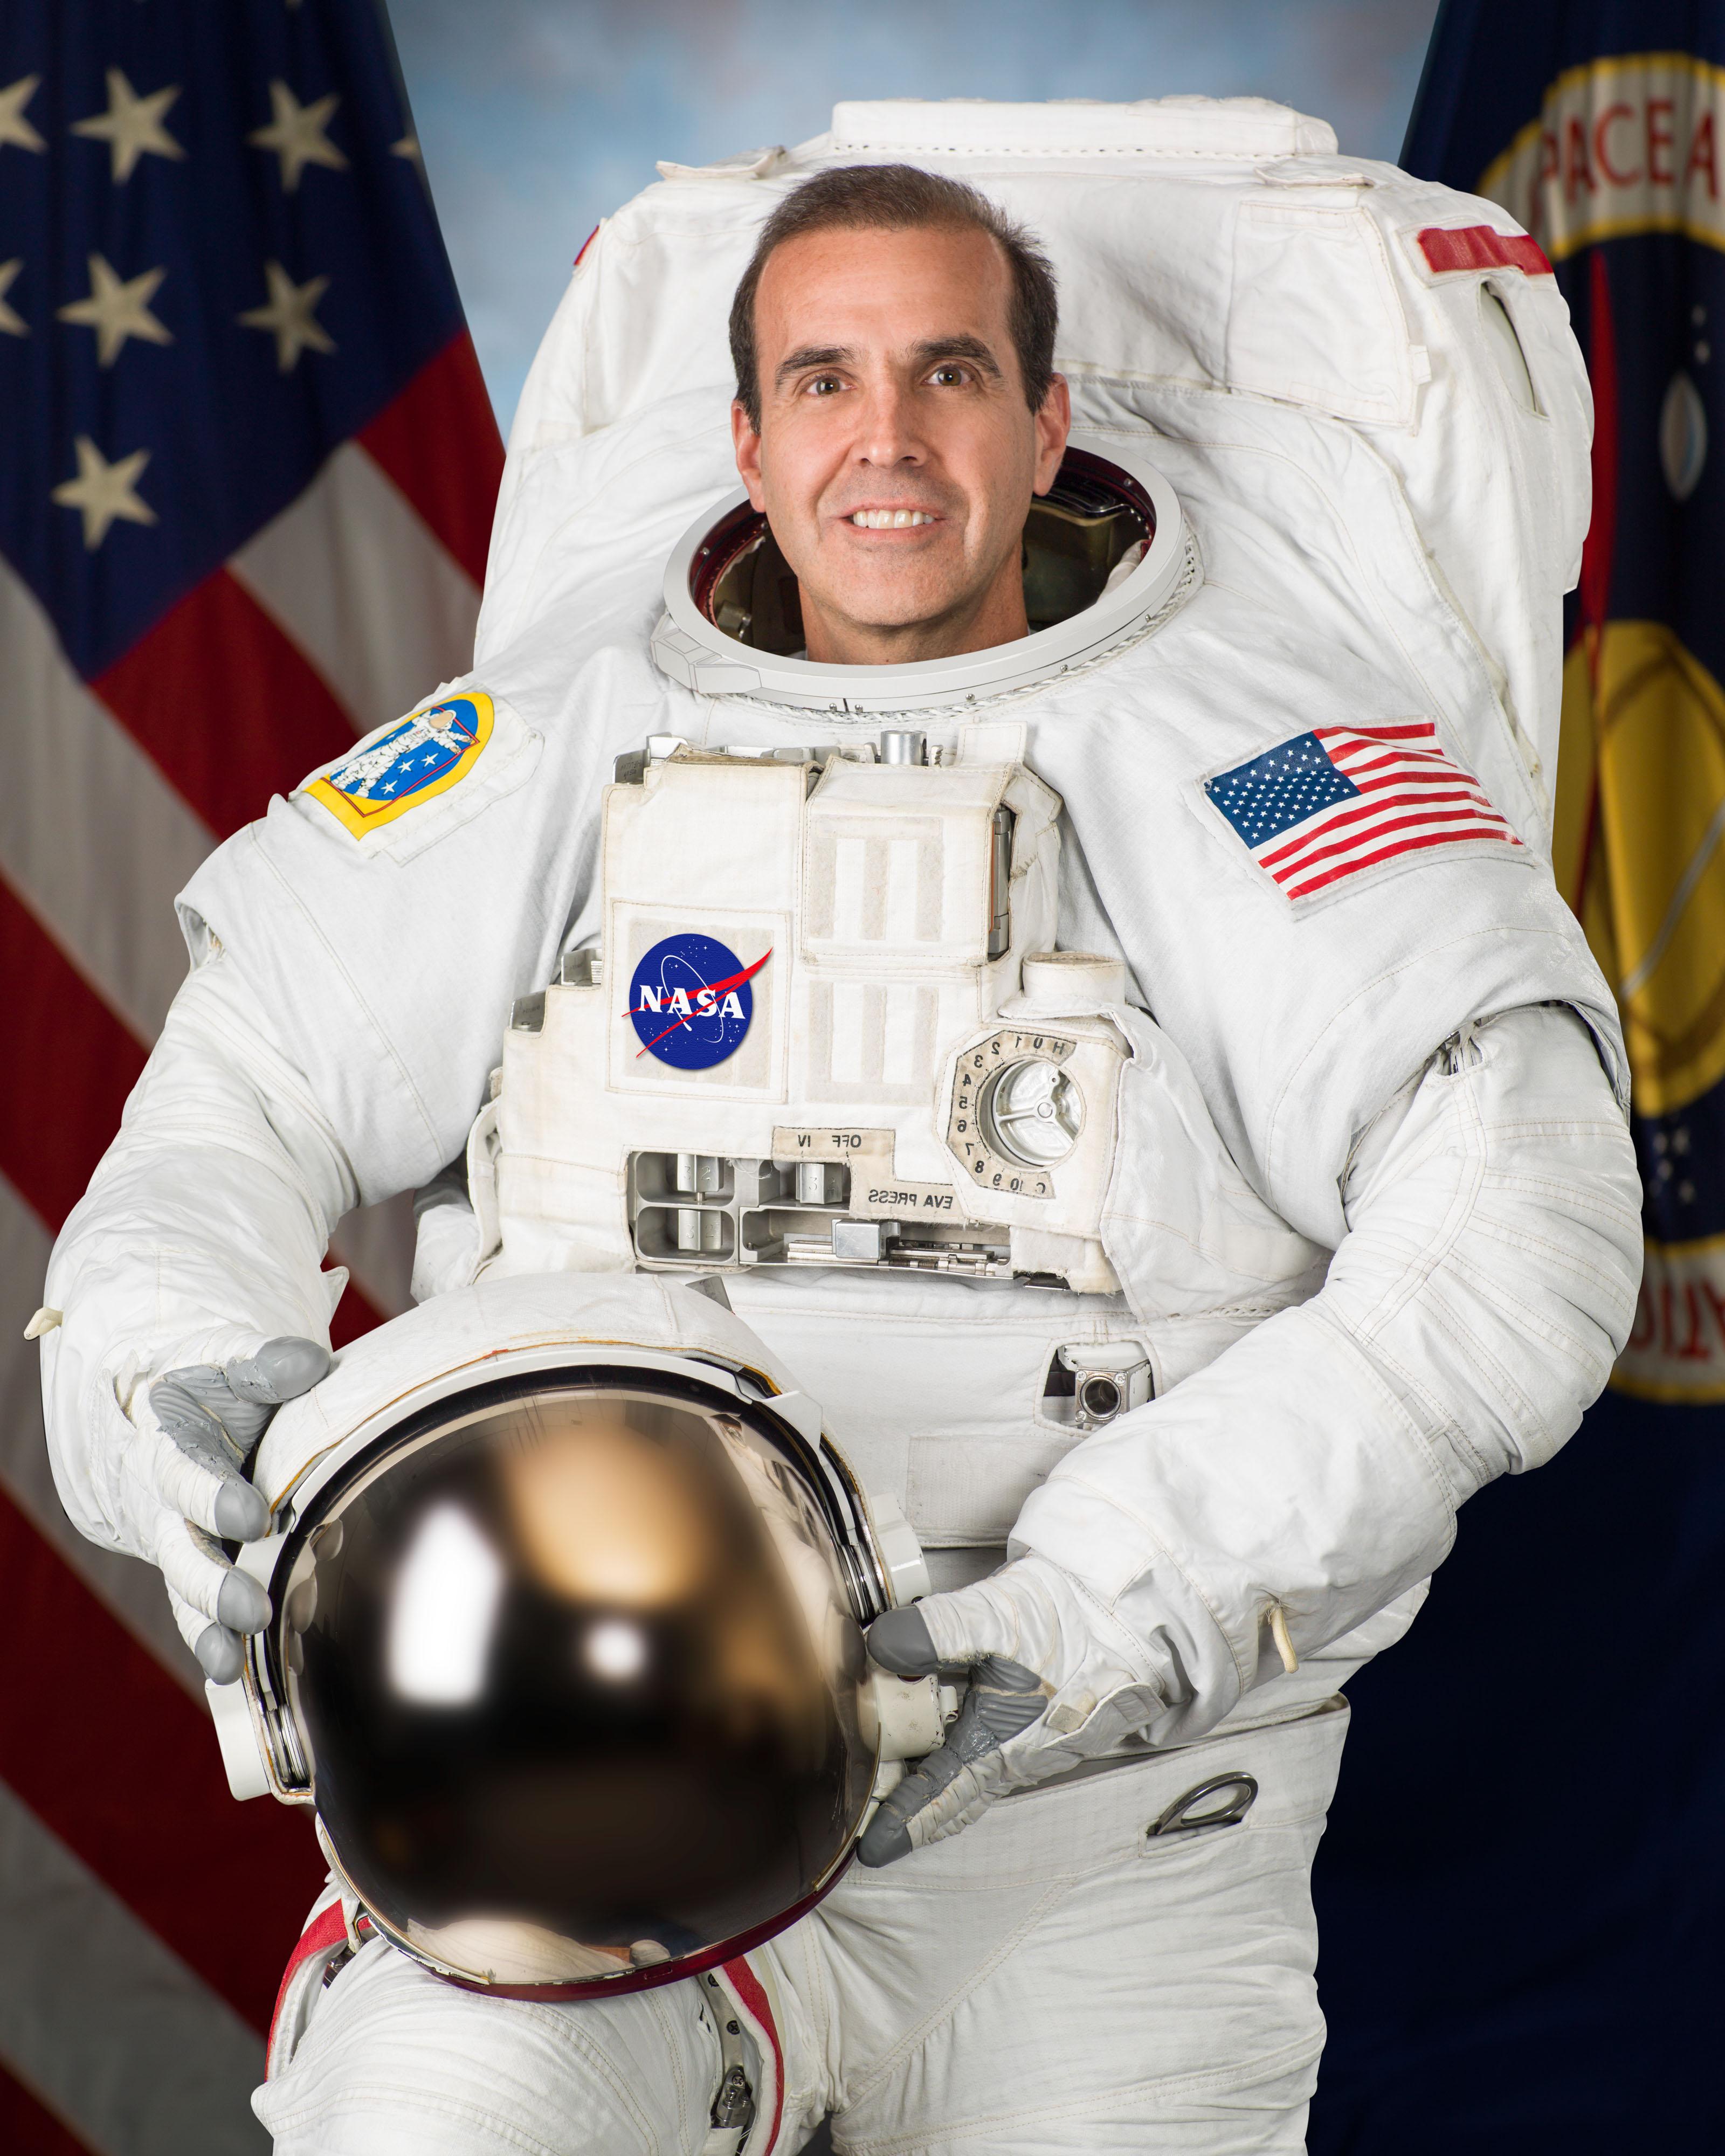 Astronaut Rick Mastracchio